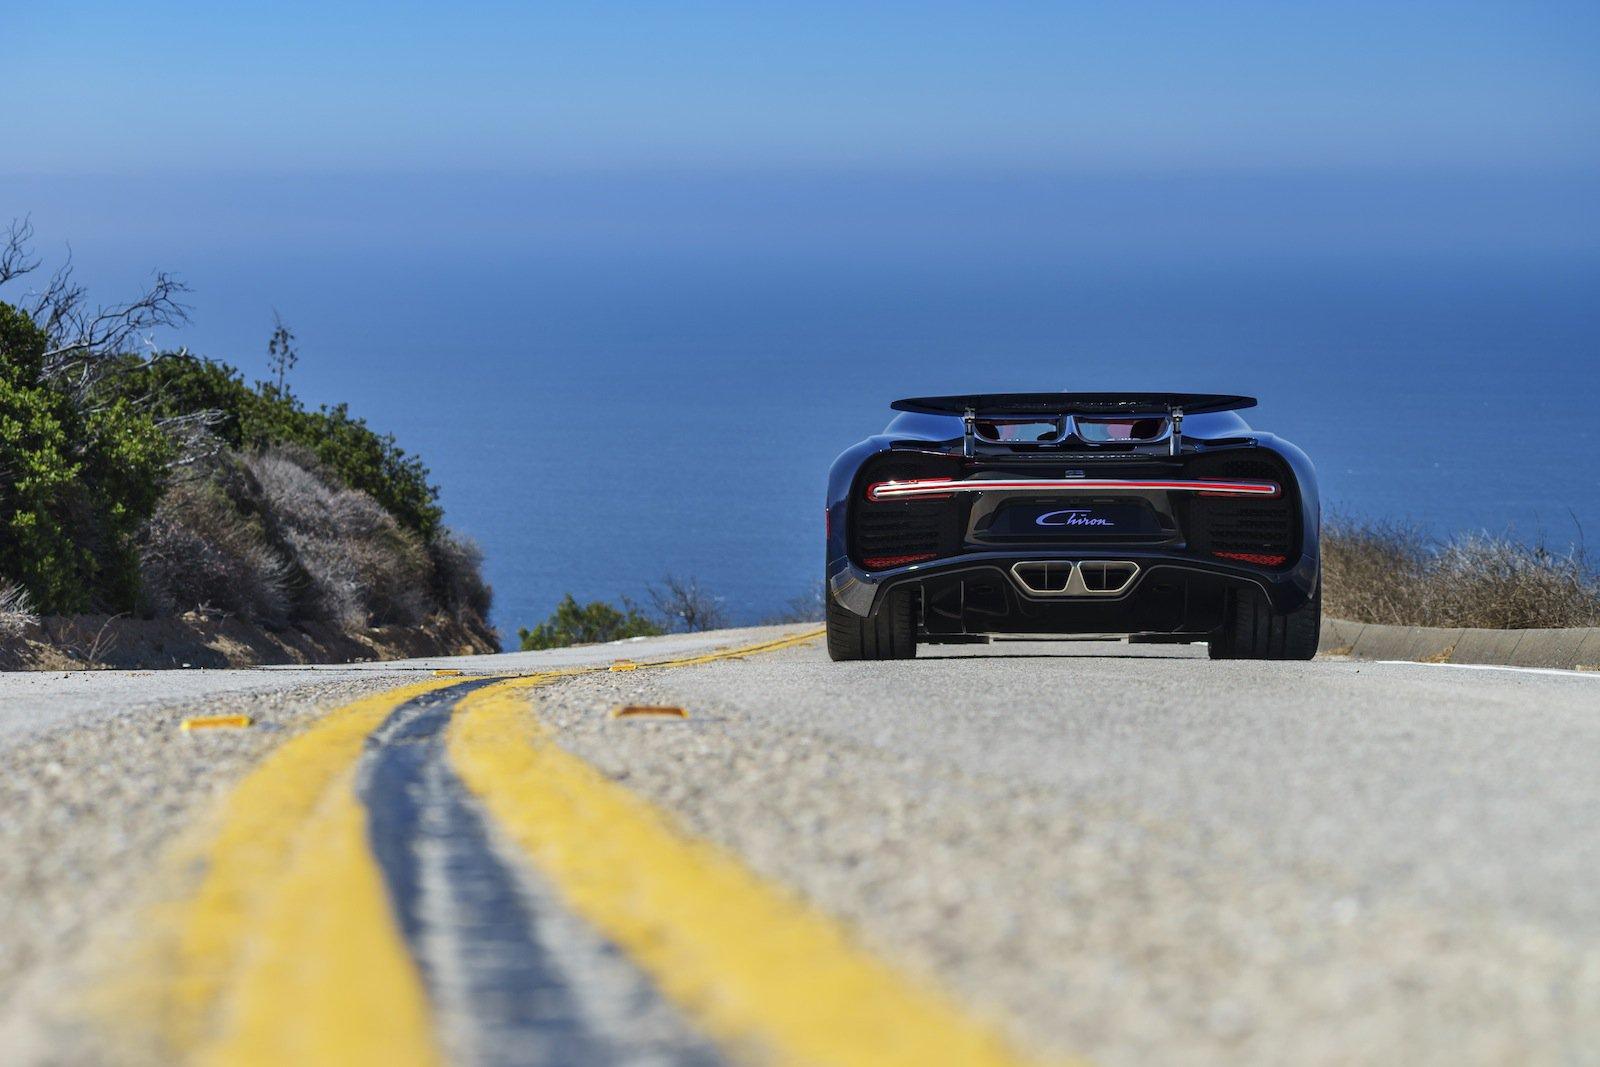 11_Bugatti_Chiron_The_Quail